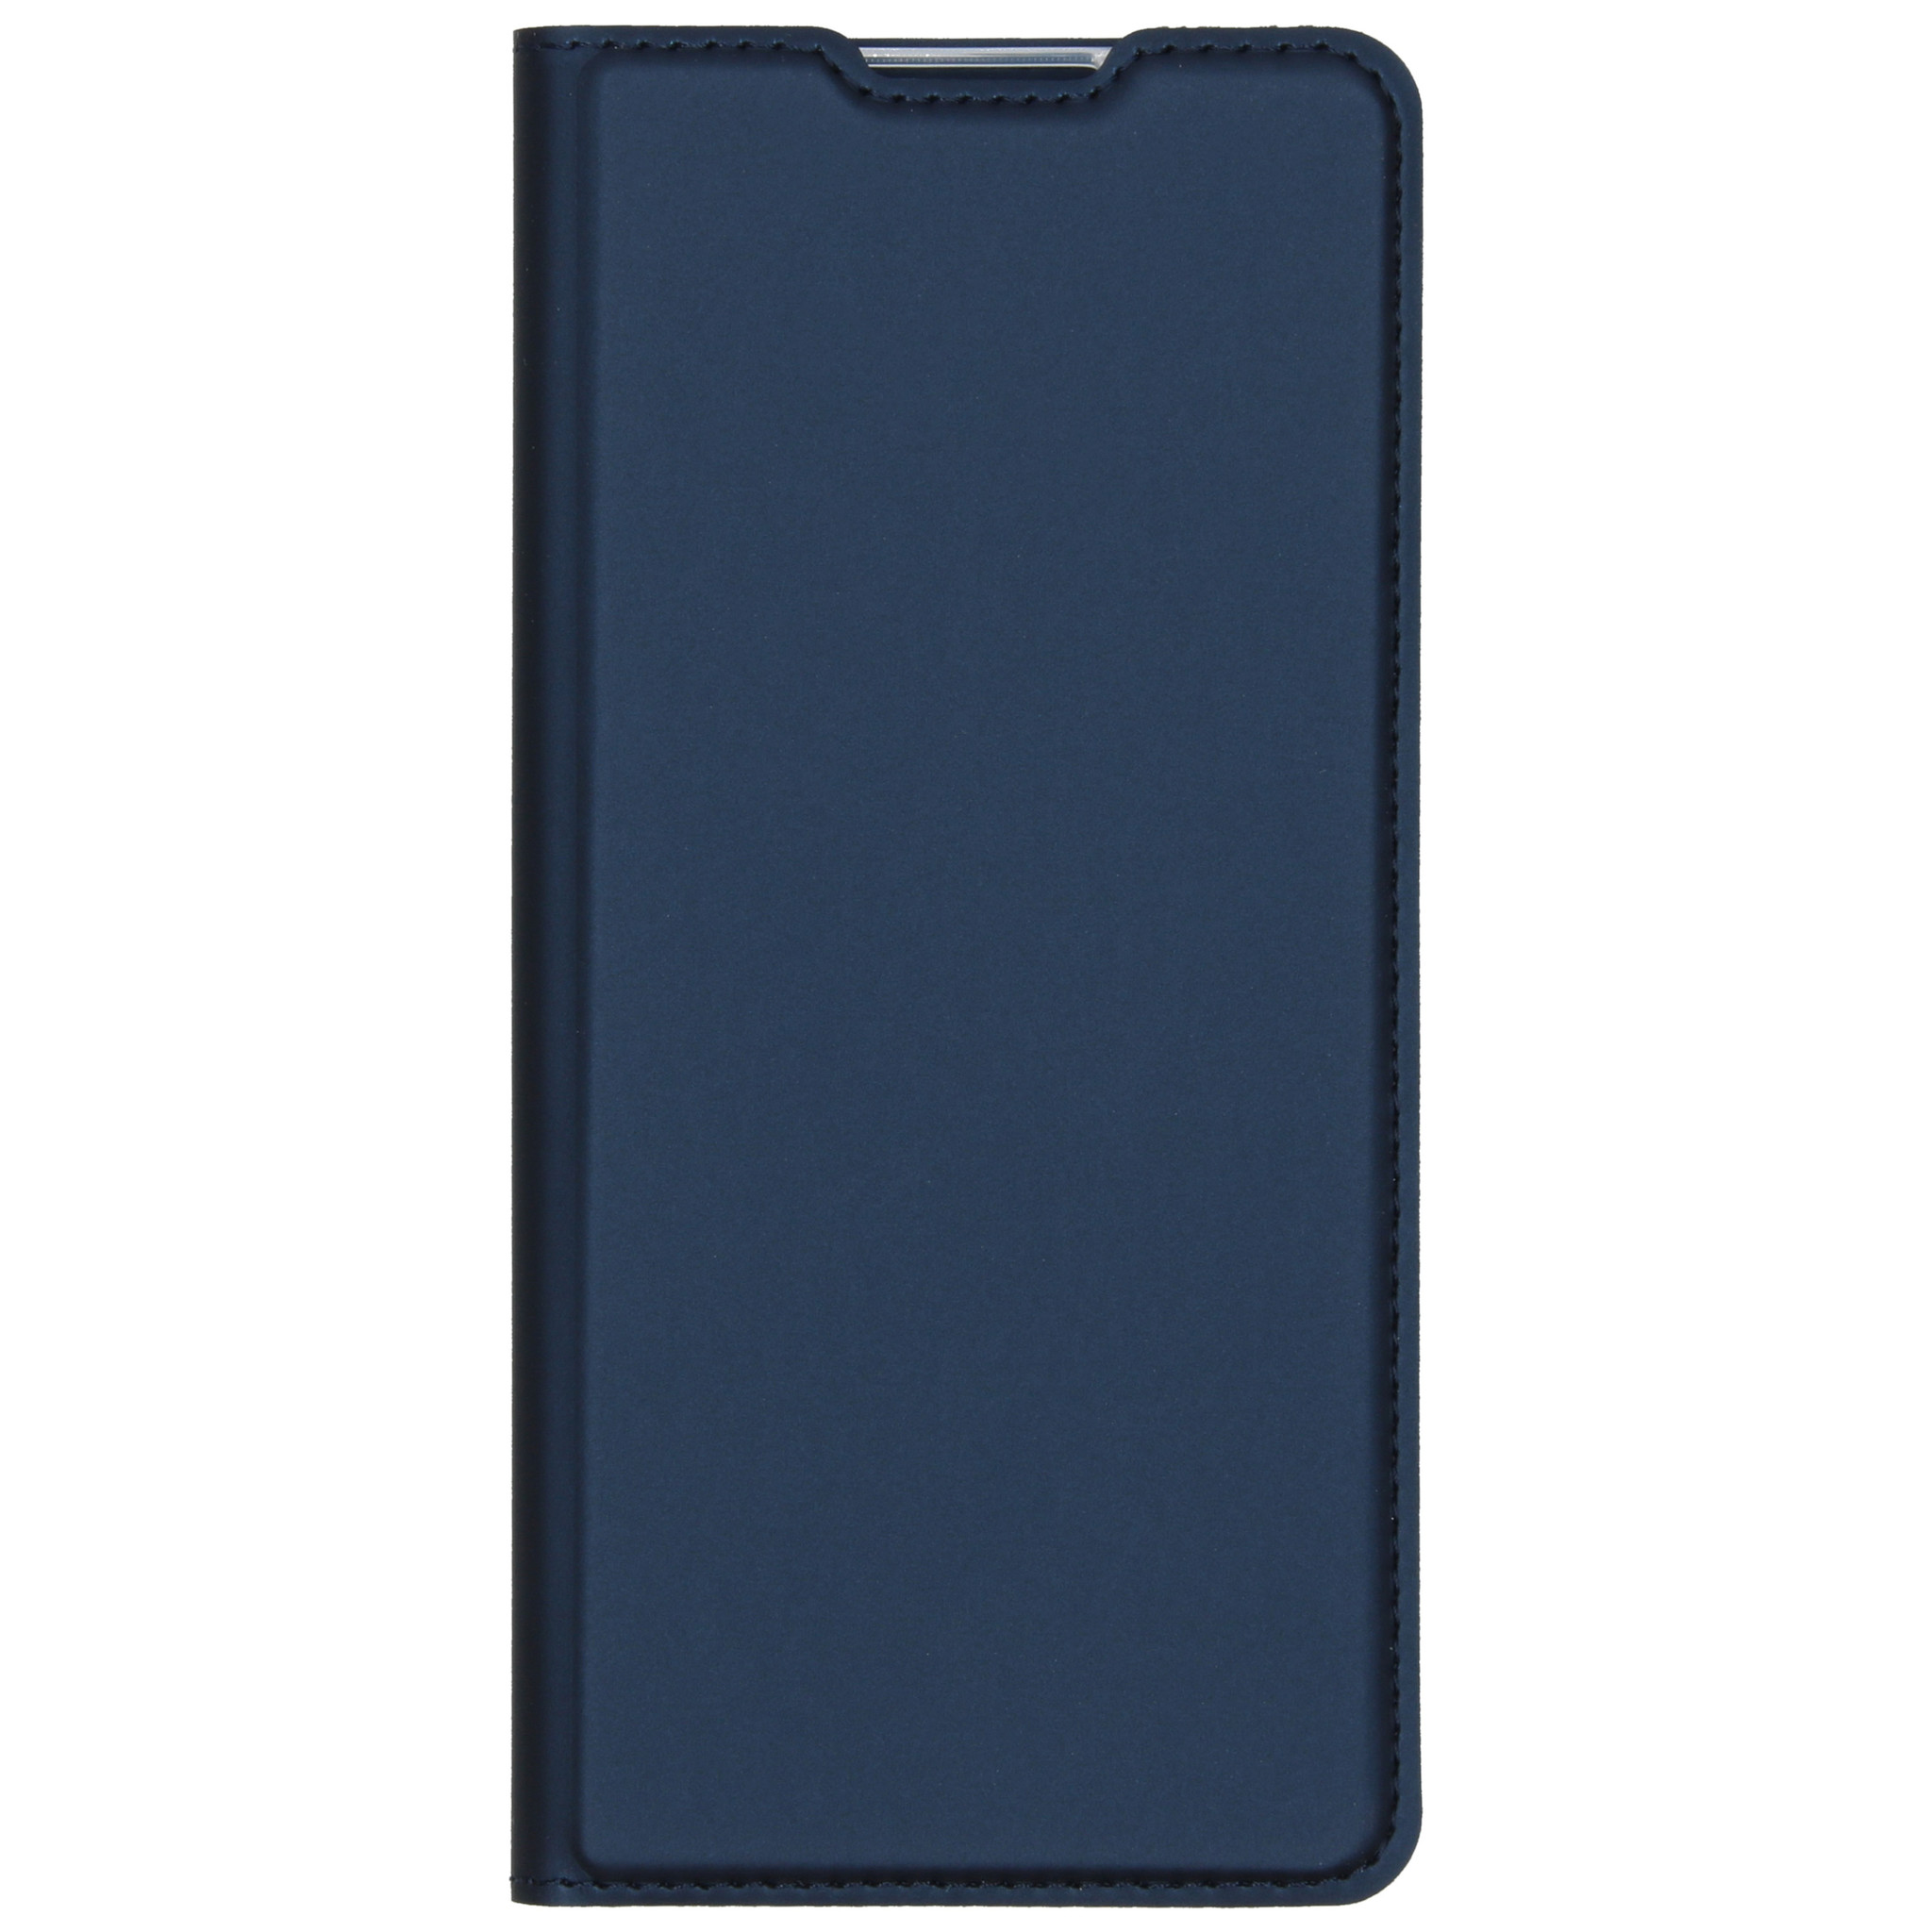 Dux Ducis Slim Softcase Booktype Oppo Reno3 Pro - Blauw